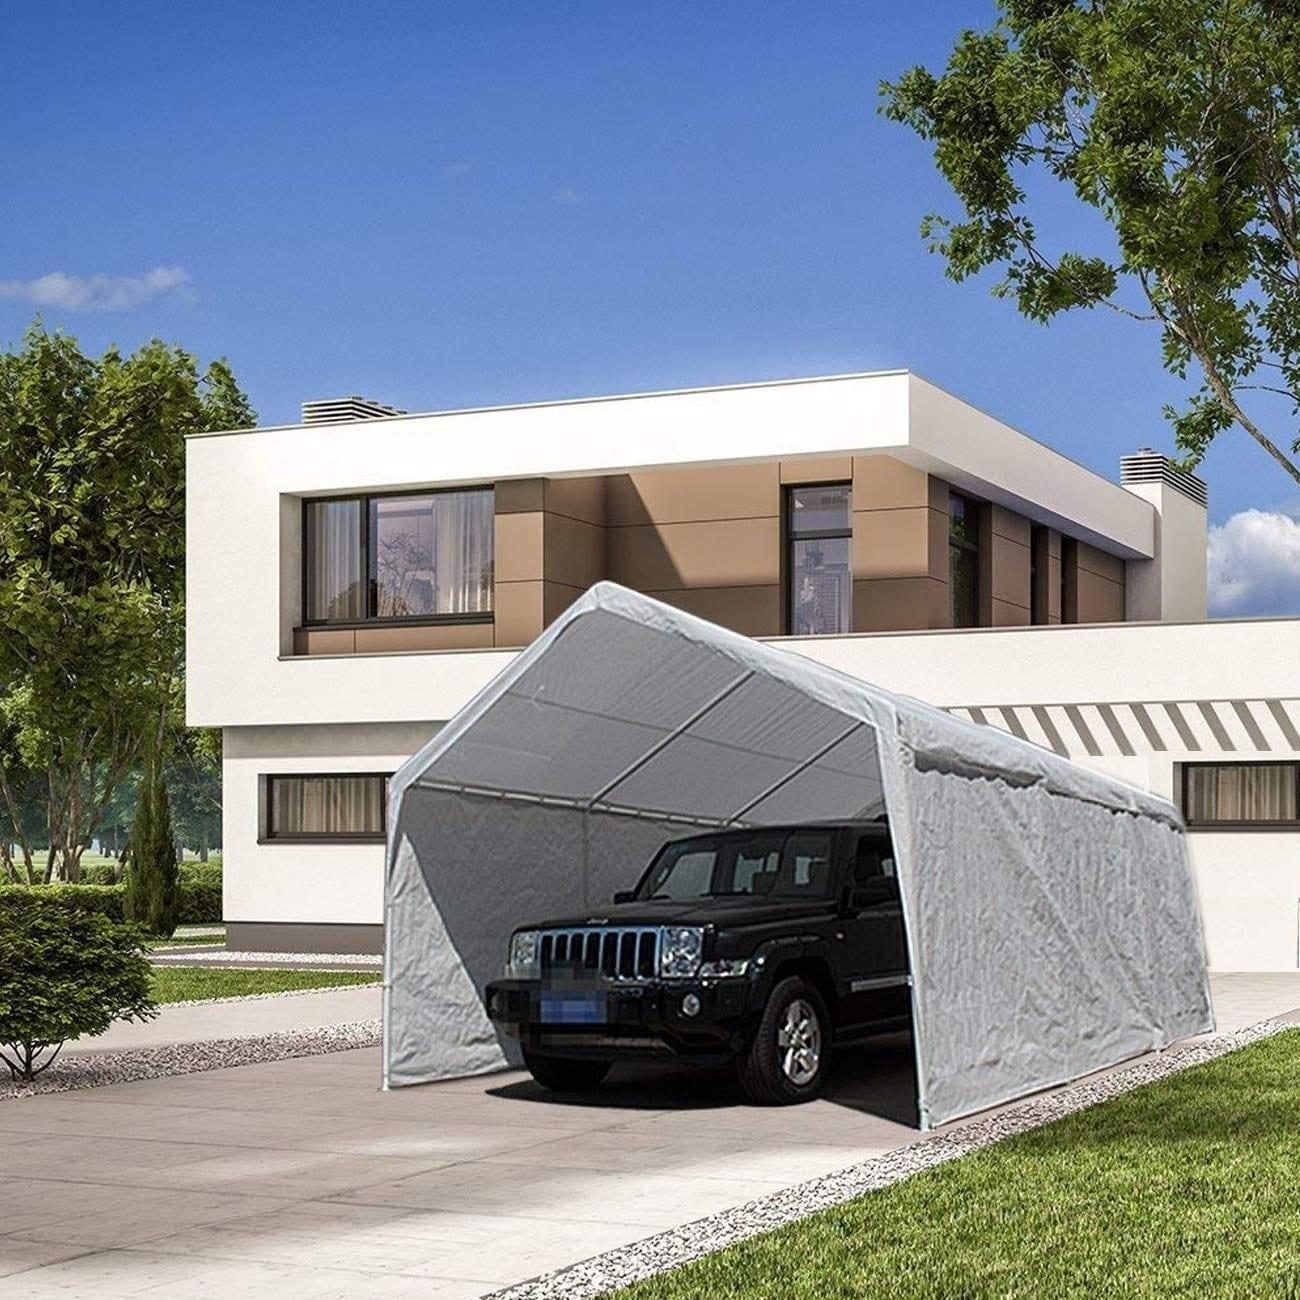 Abba Patio 12 x 20-Feet Heavy Duty Carport, Car Canopy Sh...